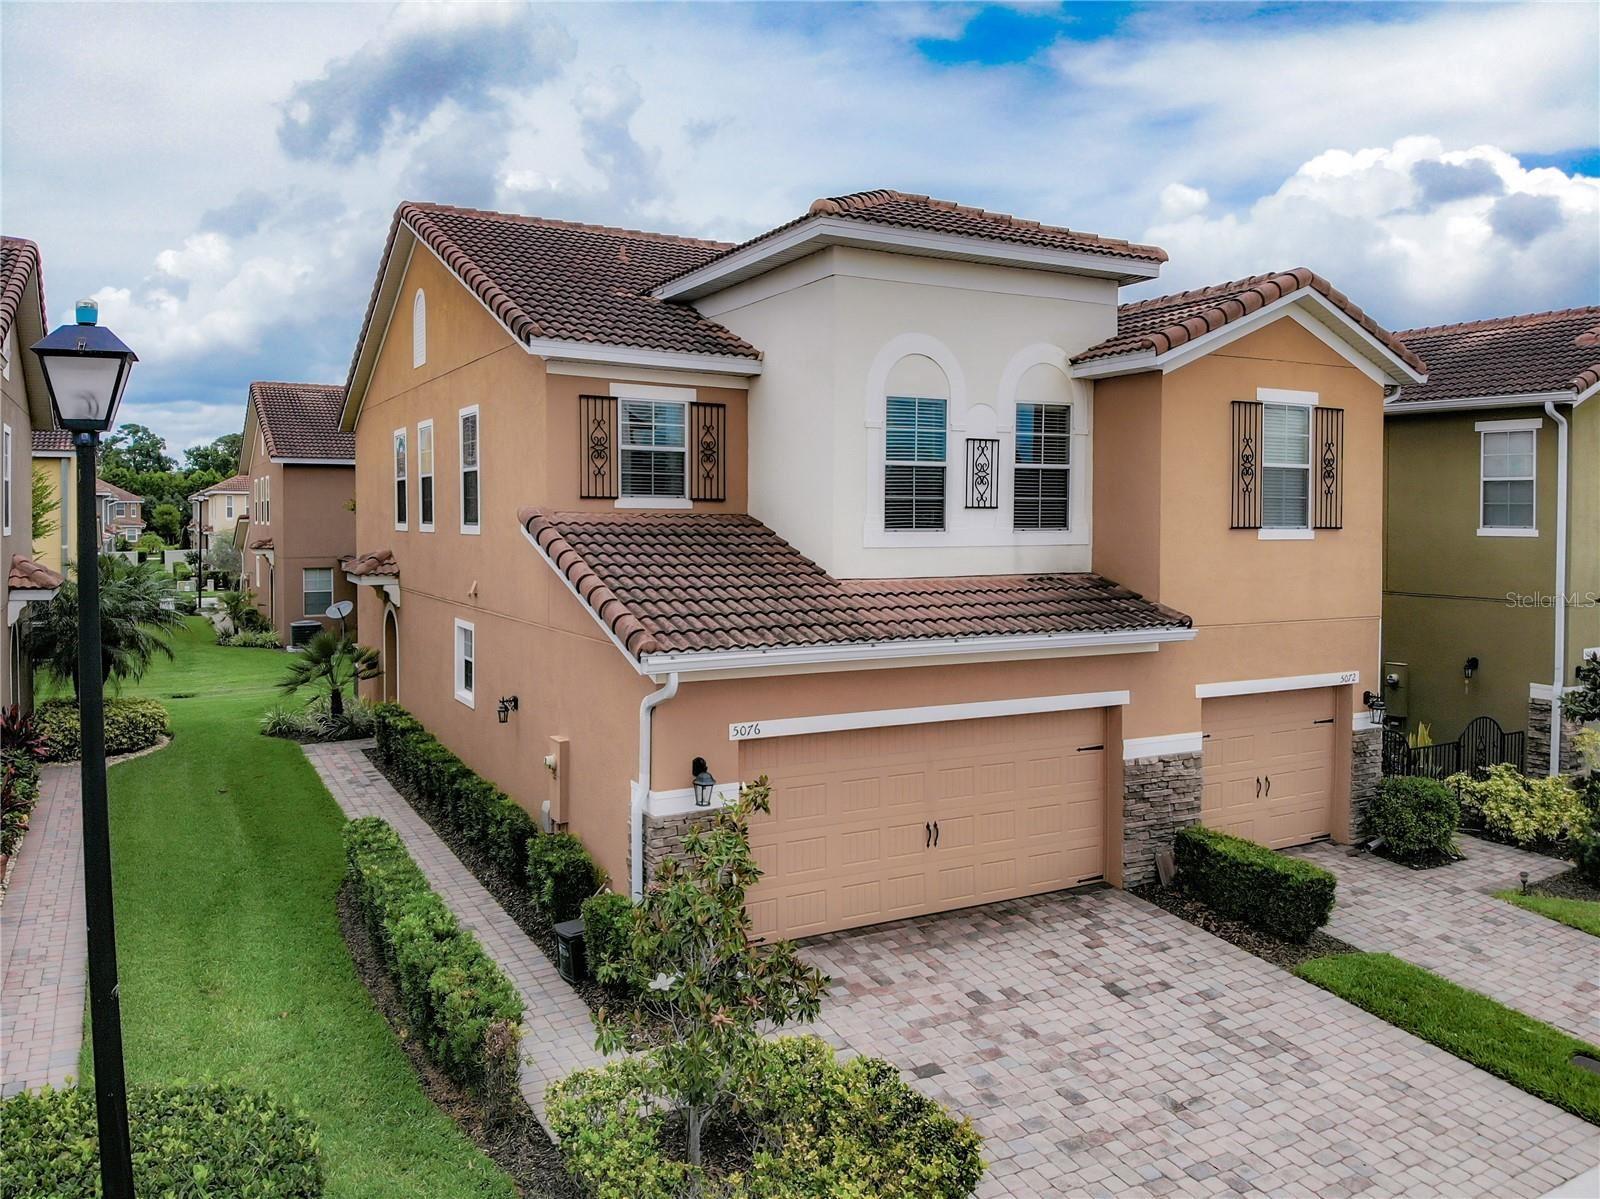 5076 FIORELLA LANE, Sanford, FL 32771 - #: O5952789